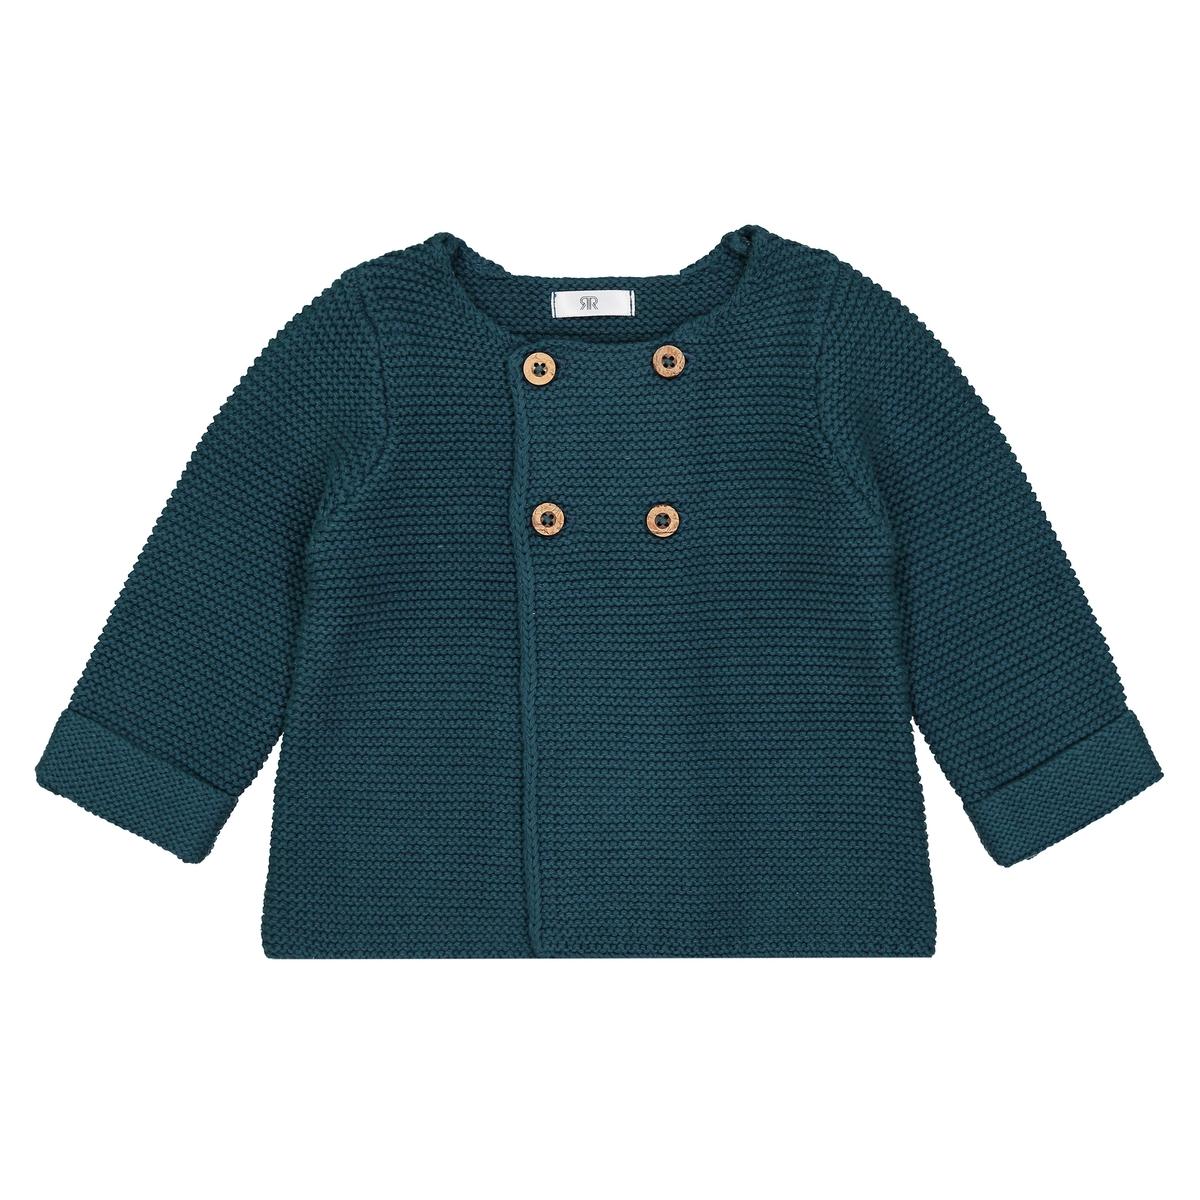 Cardigan nascita in maglia dai prematuri ai 2 anni